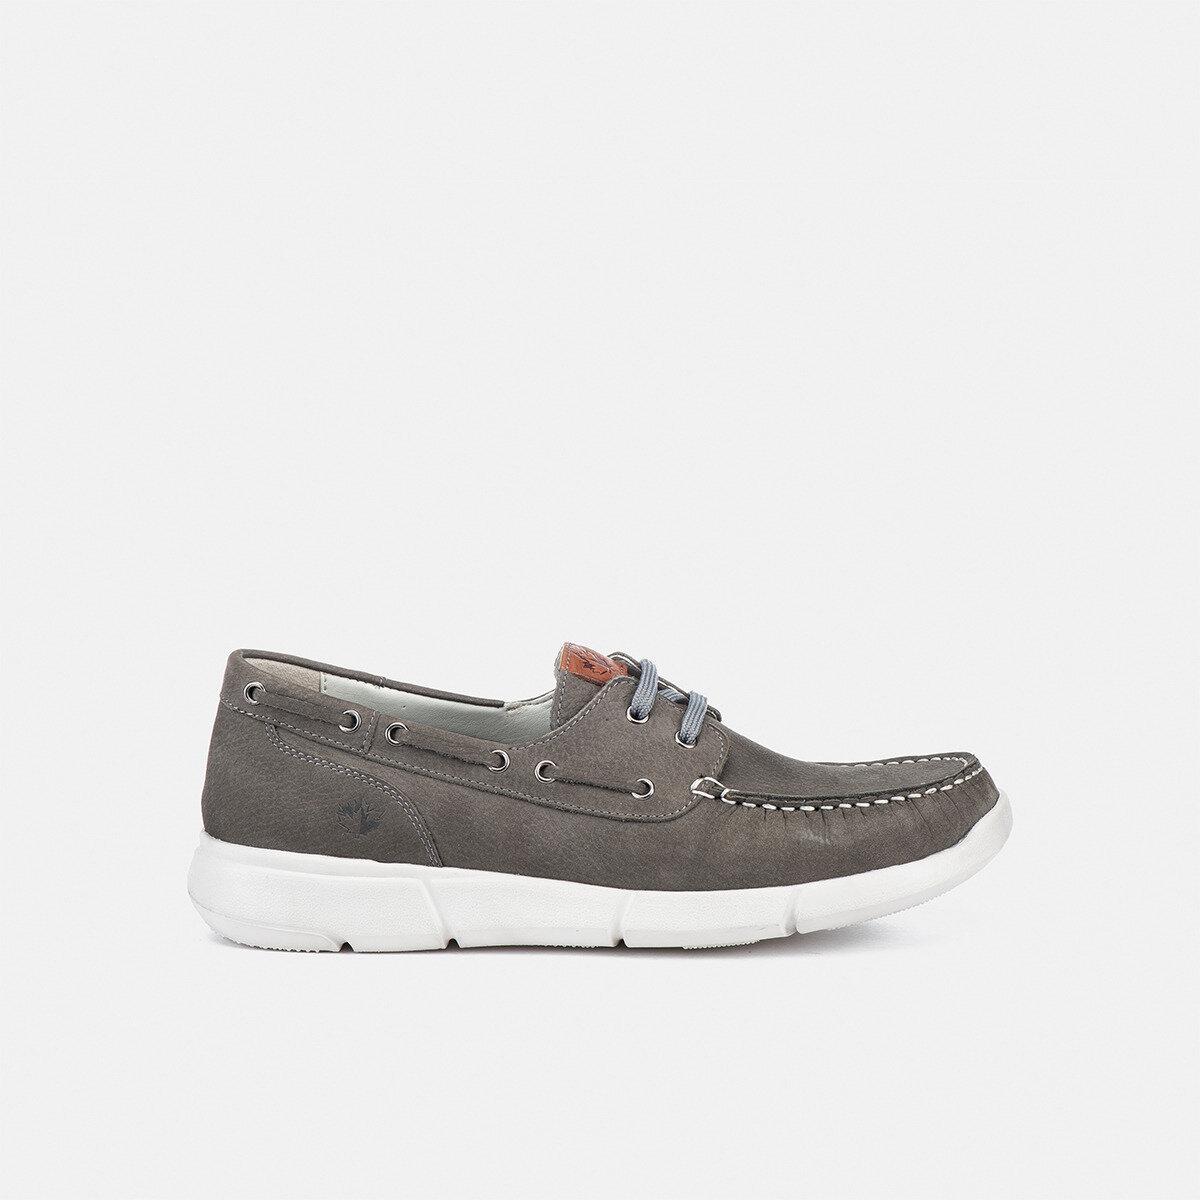 LEAF ASH GREY Man Boat shoes